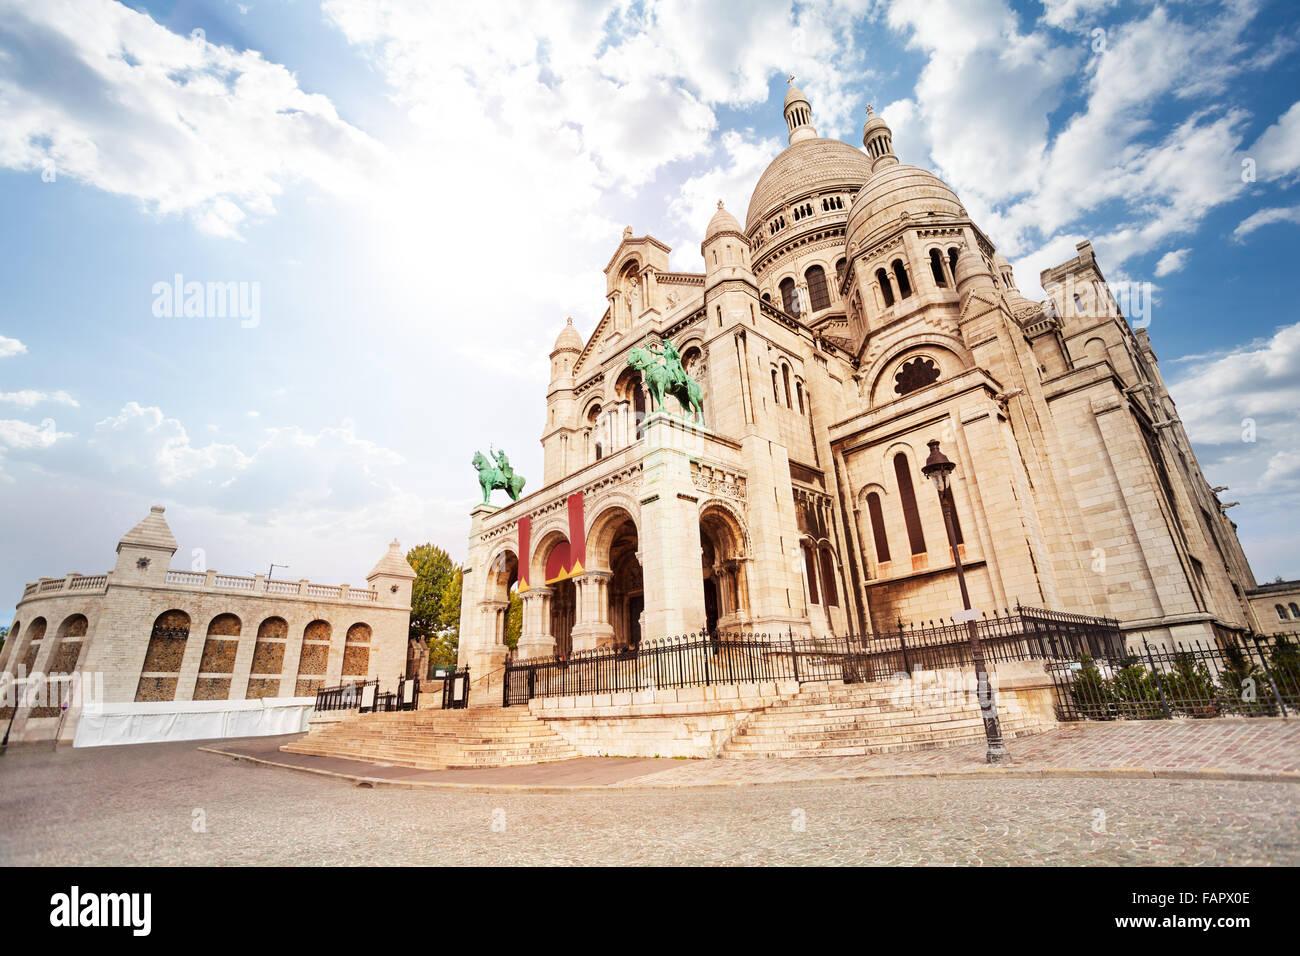 Basilica of the Sacred Heart, Paris, France - Stock Image